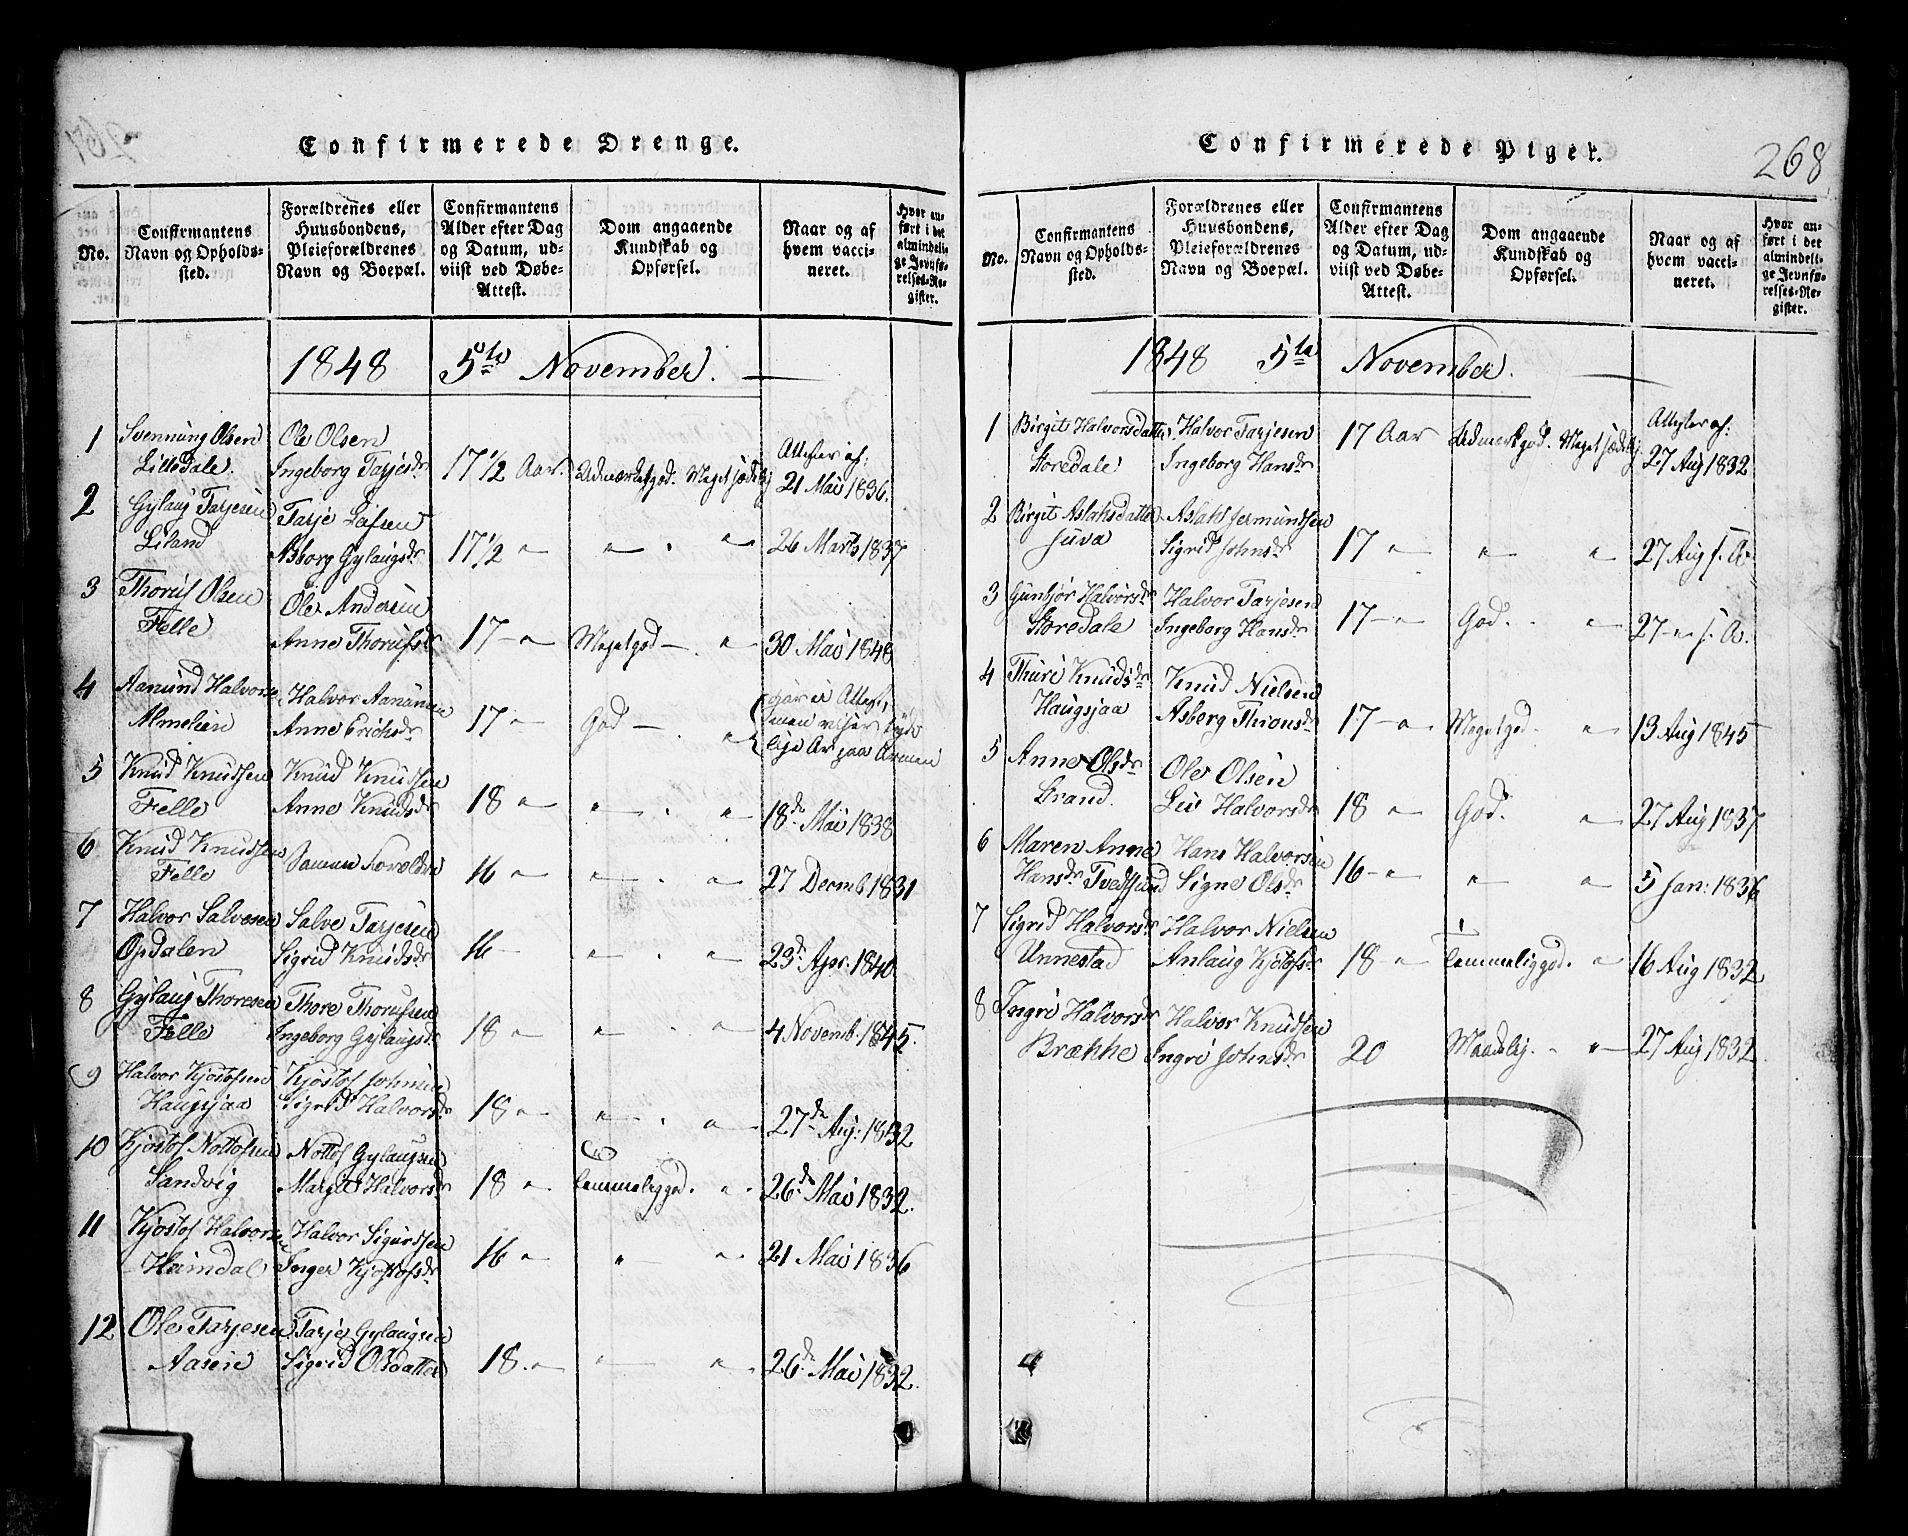 SAKO, Nissedal kirkebøker, G/Gb/L0001: Klokkerbok nr. II 1, 1814-1862, s. 268